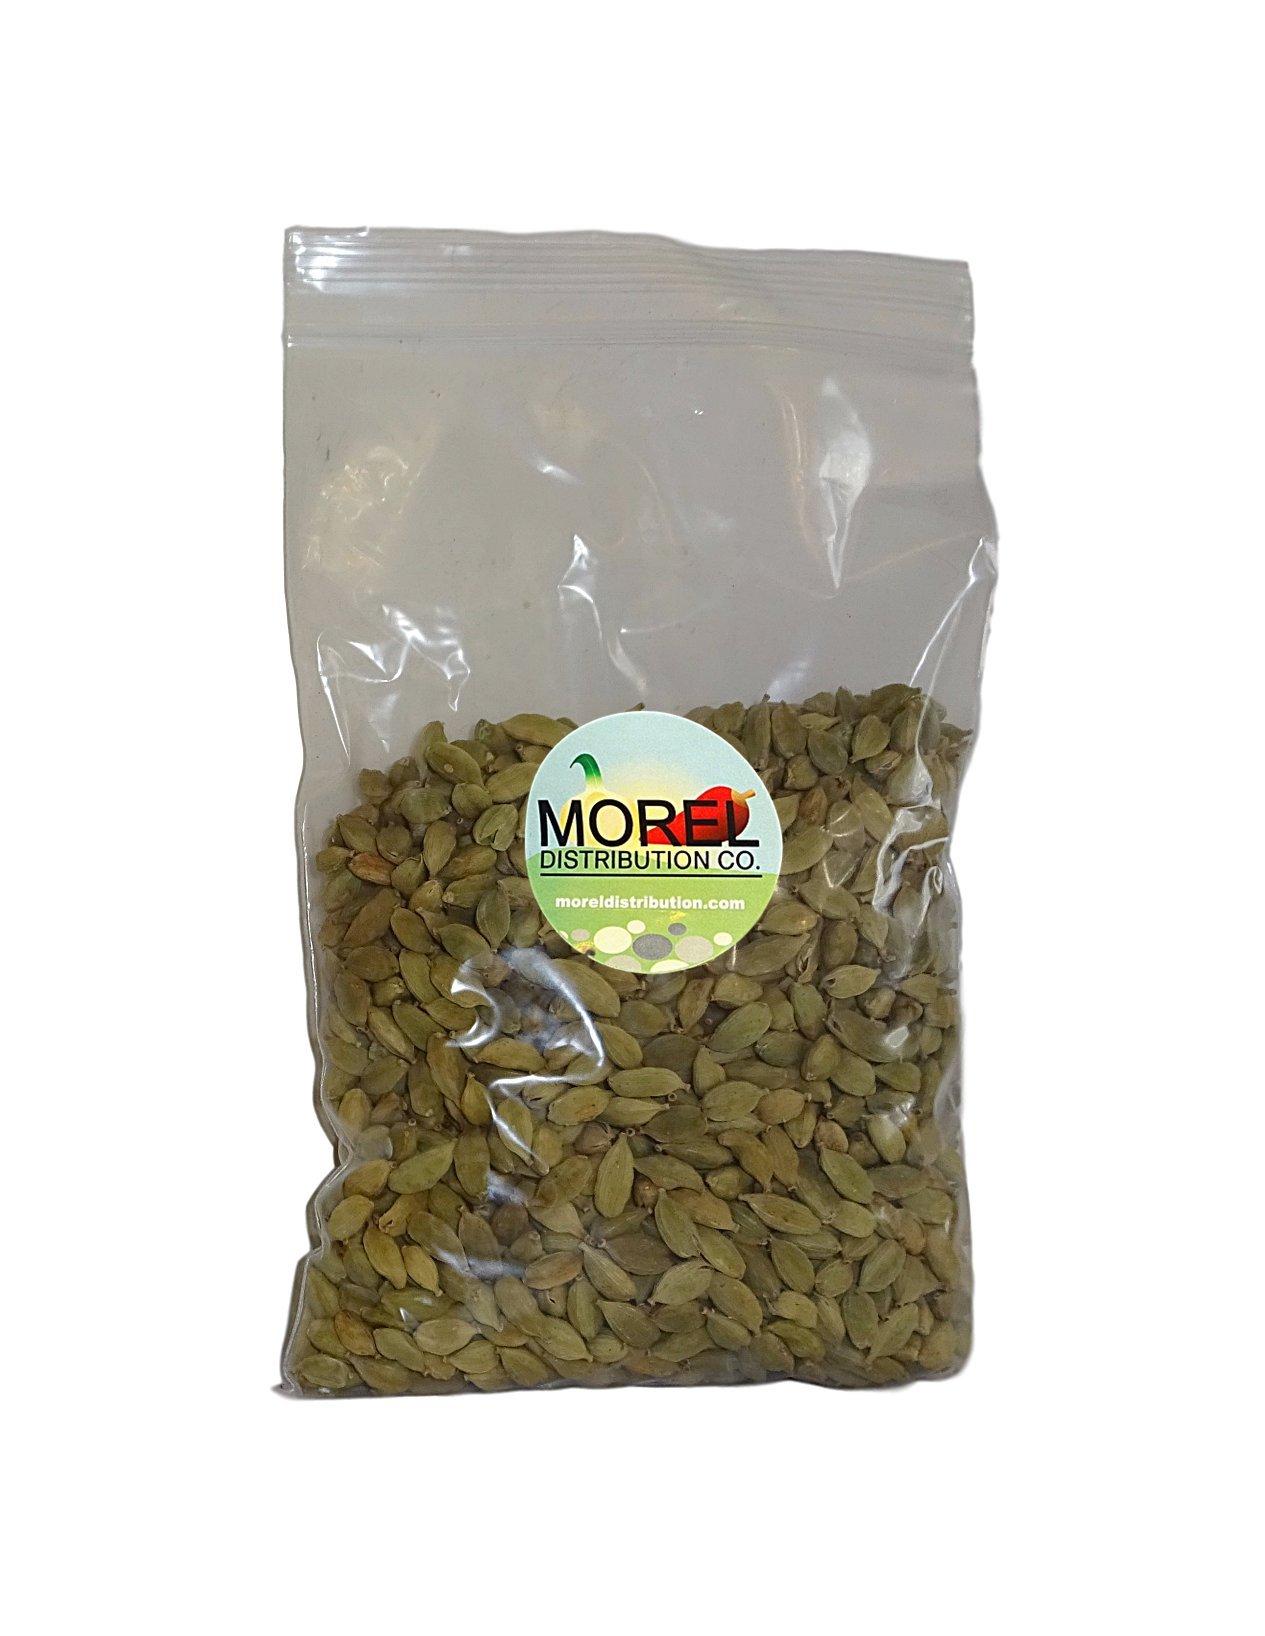 Whole Cardamom Pods/Seeds (Cardamomo) (1 oz, 2 oz, 4 oz, 6 oz, 8 oz, 12 oz, 1 lb, 2 lbs) (8 OZ) by Morel Distribution Company (Image #2)